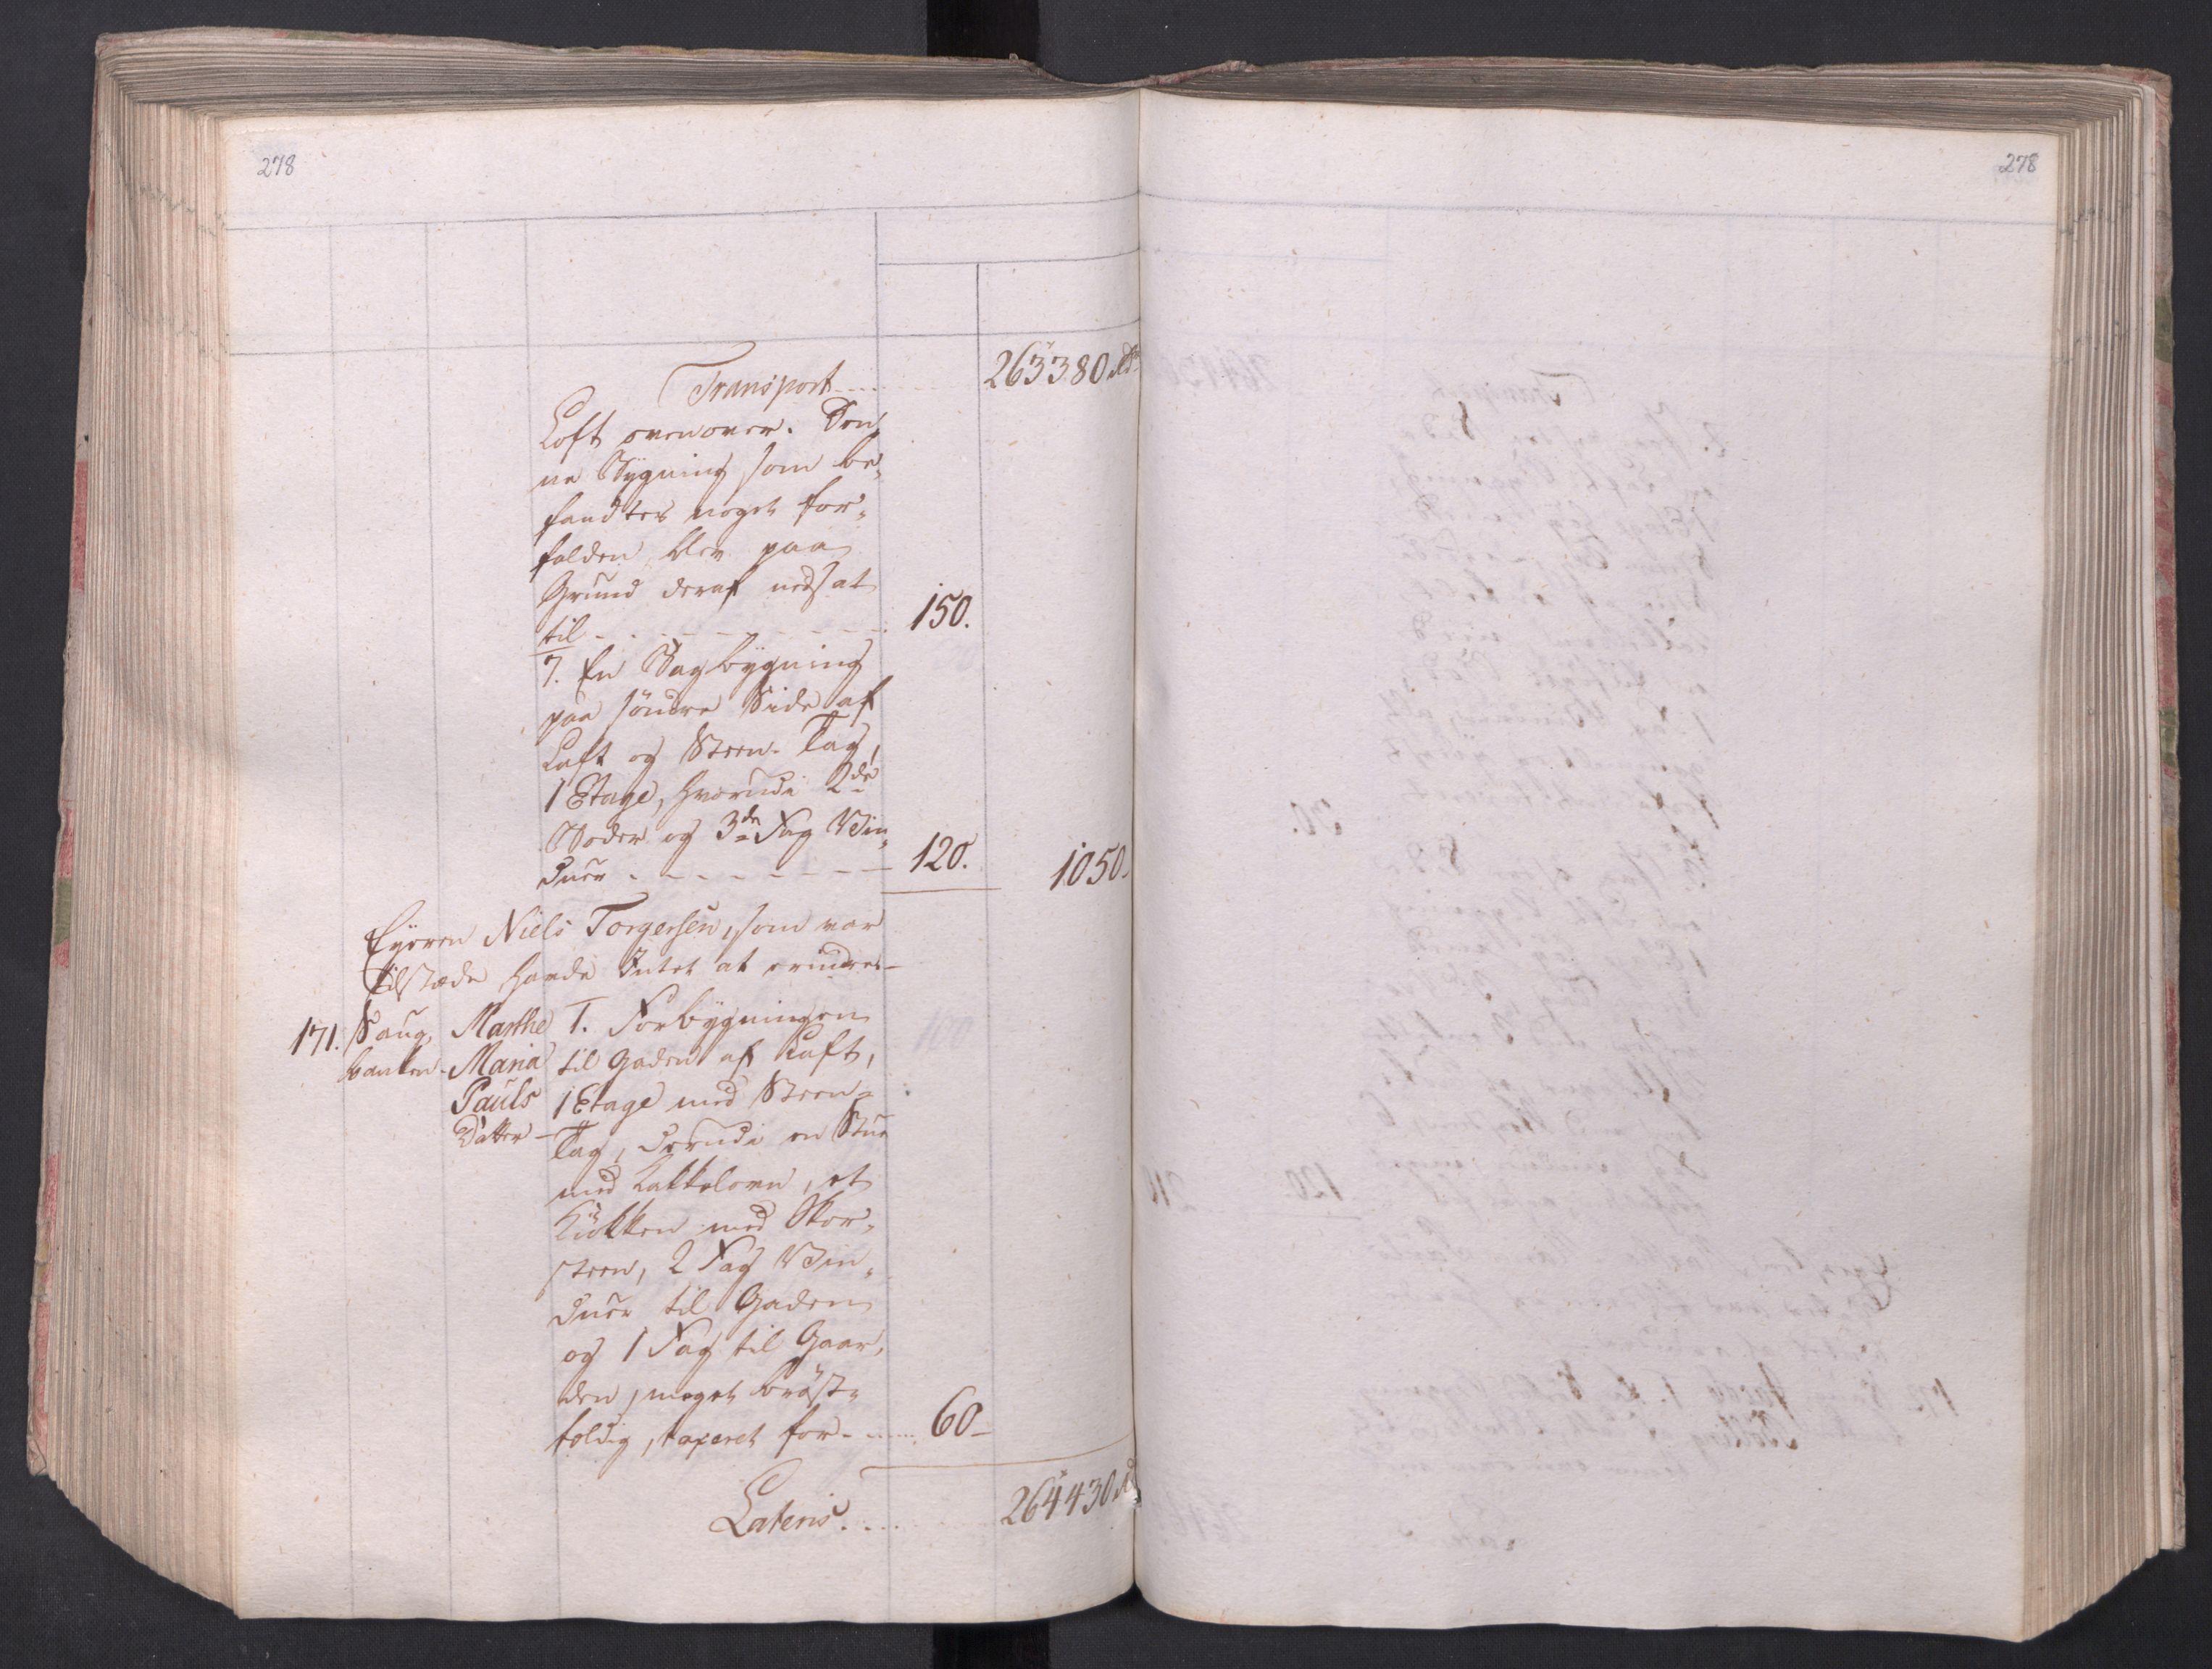 SAO, Kristiania stiftamt, I/Ia/L0015: Branntakster, 1797, s. 278